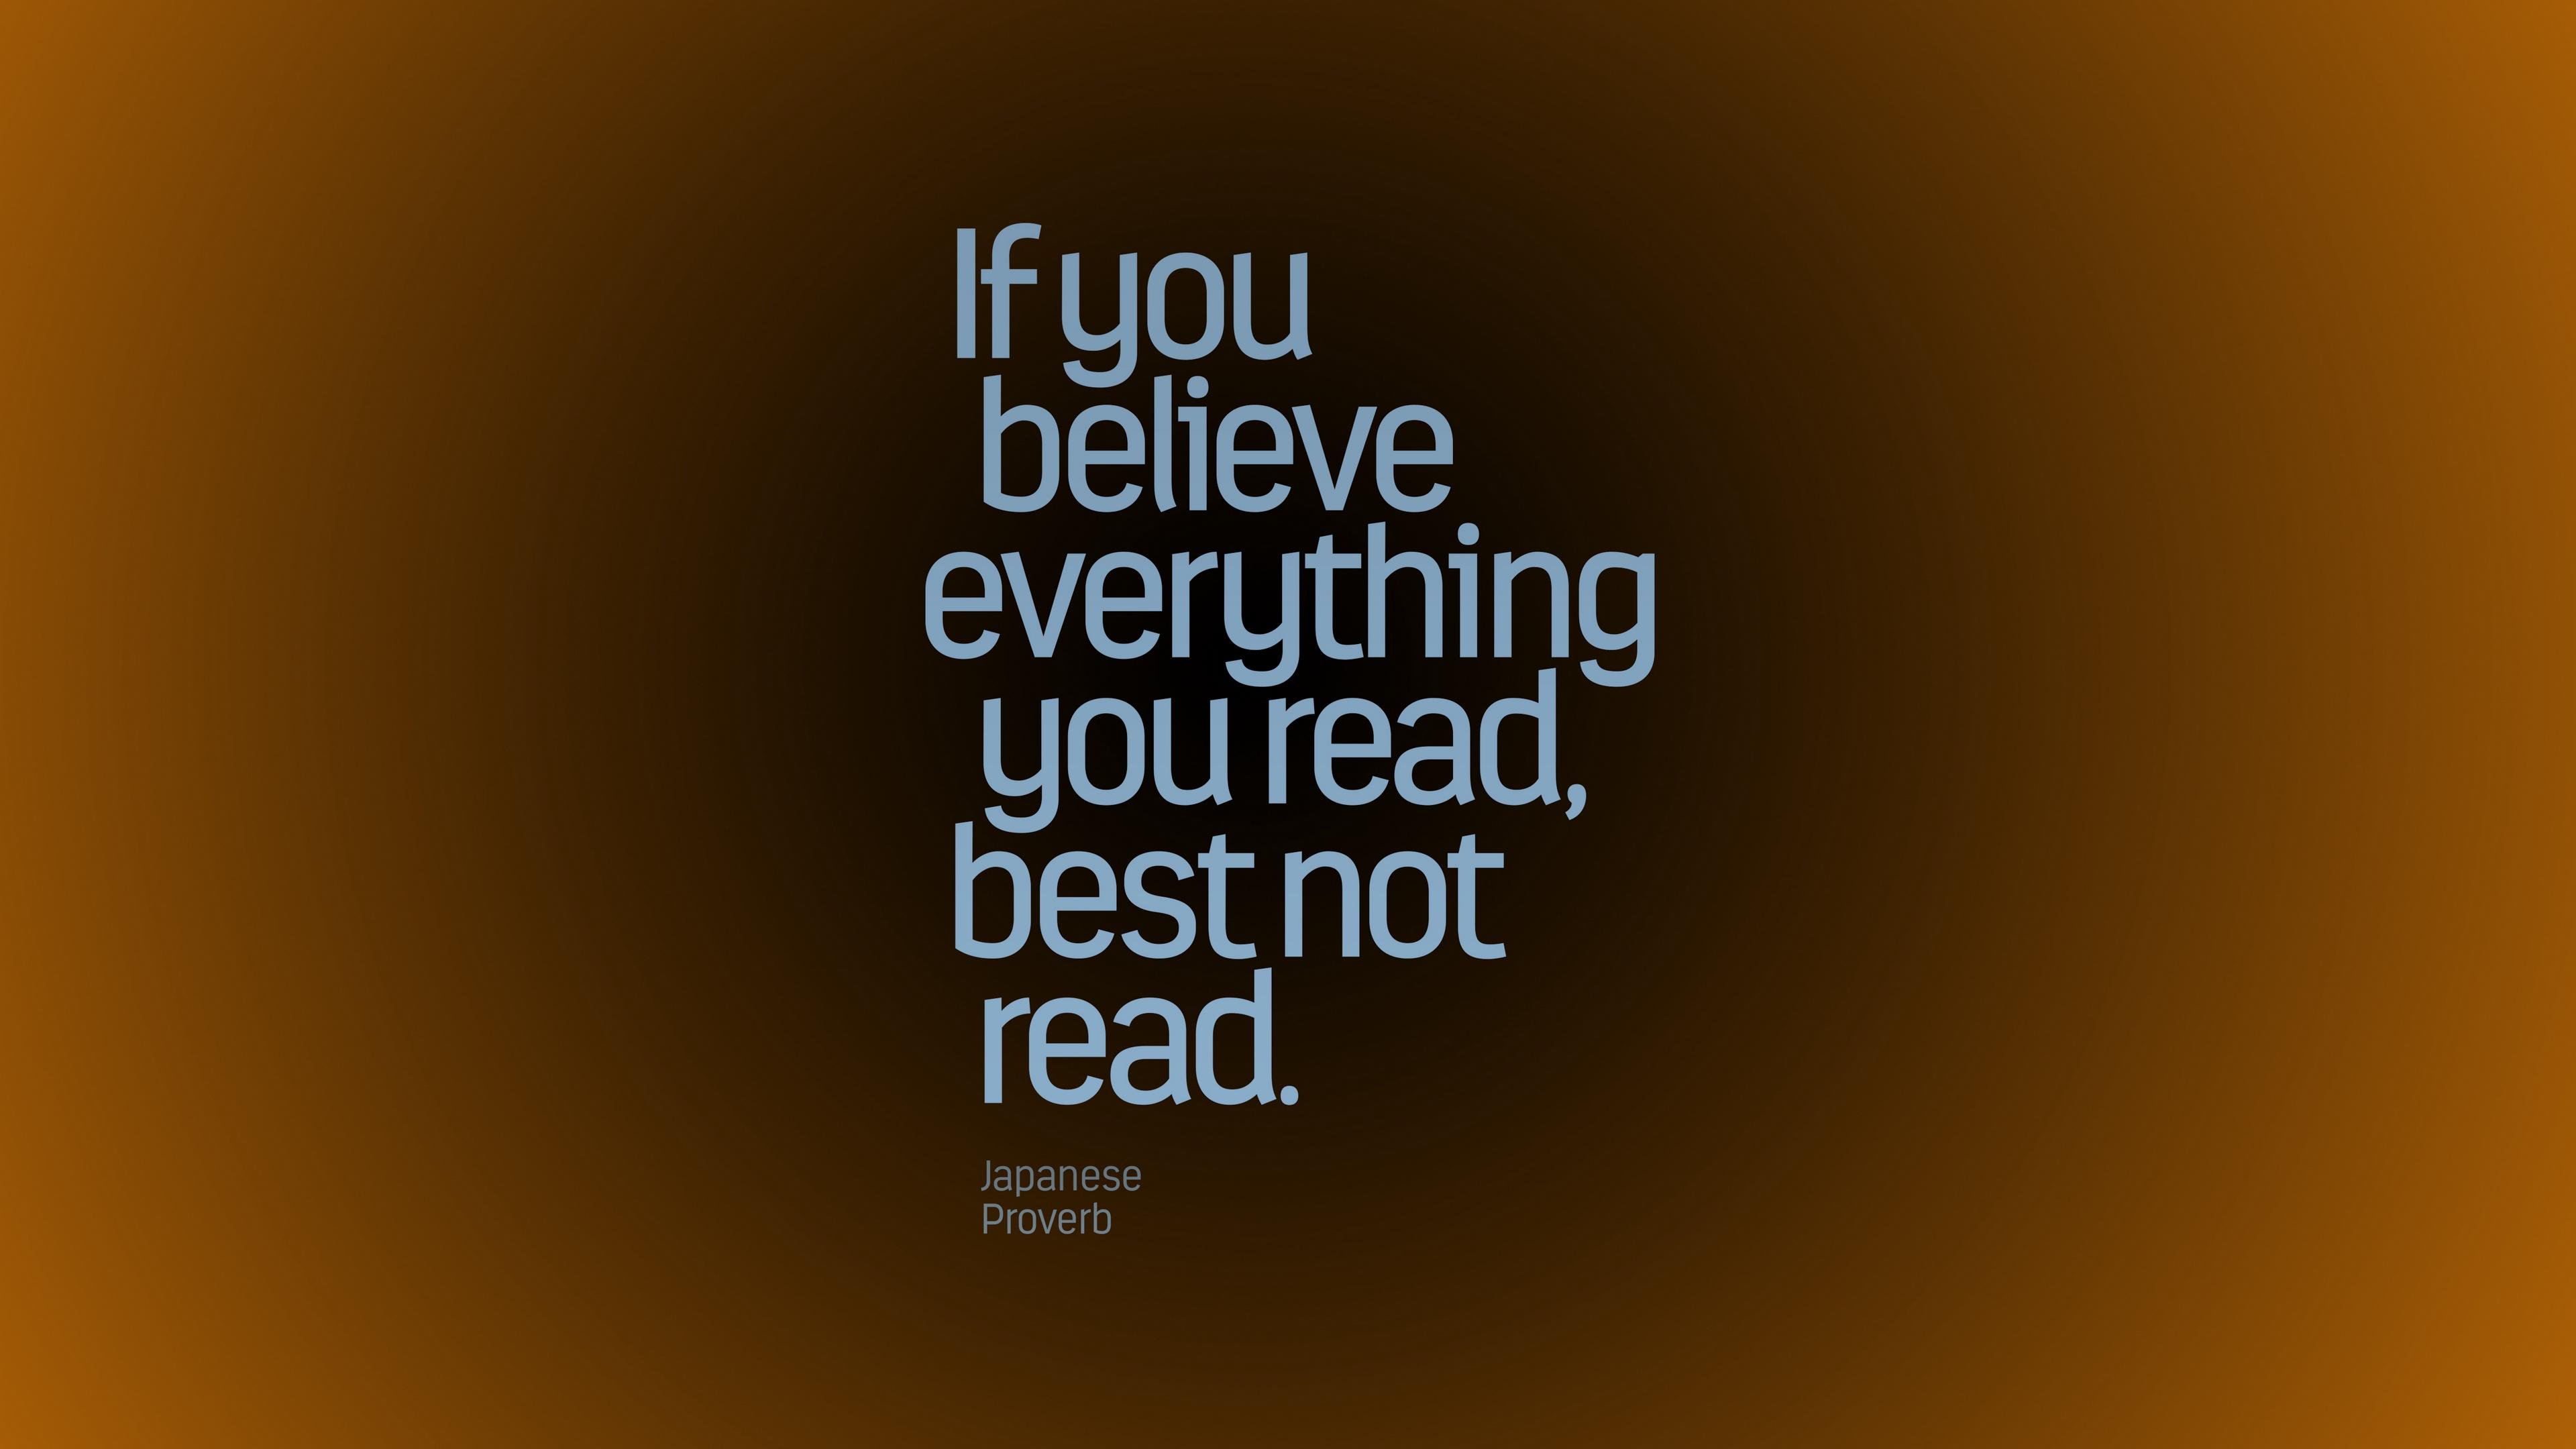 Download wallpaper 3840x2160 inscription proverb advice wisdom 3840x2160